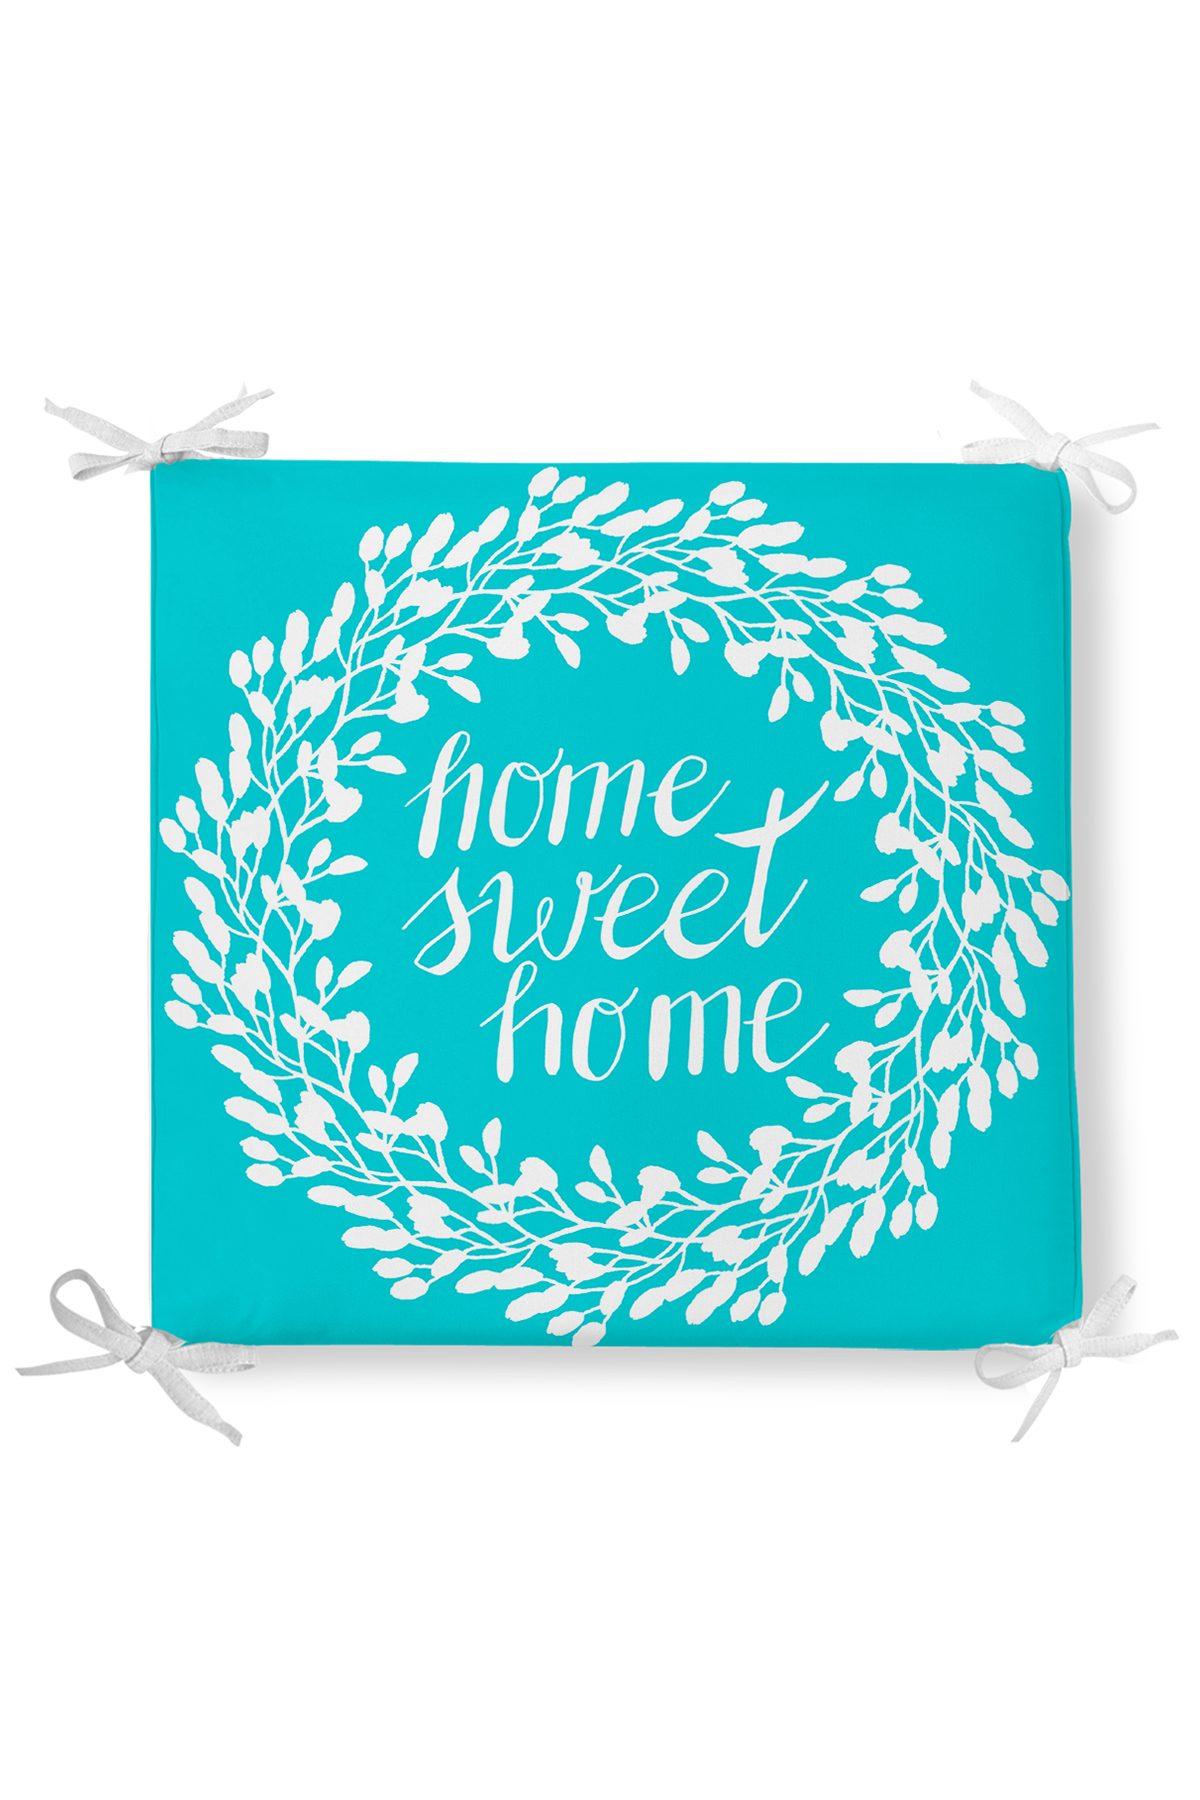 Home Sweet Home Dekorati Kare Sandalye Minderi 40x40cm Fermuarlı Realhomes